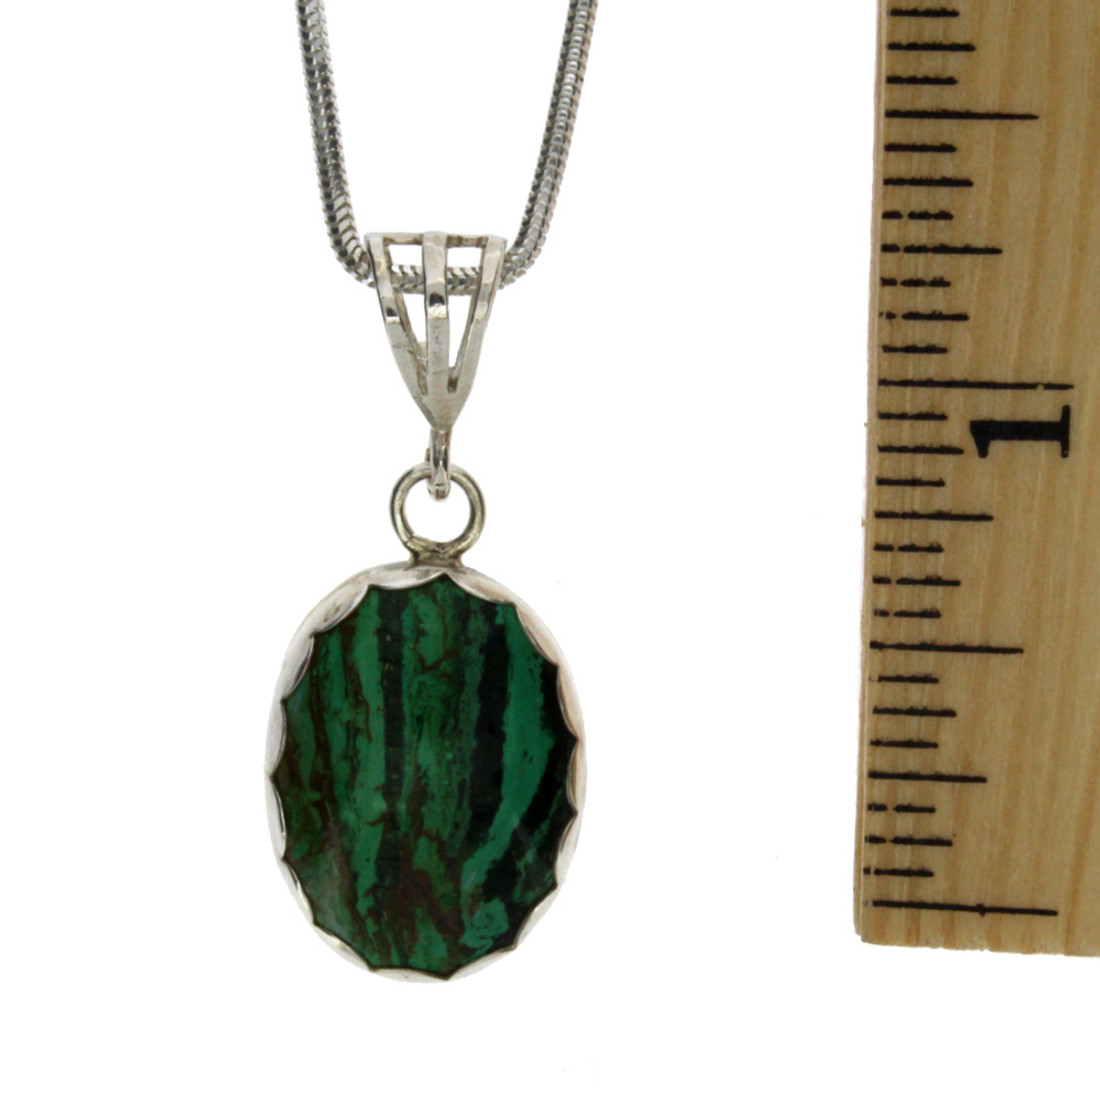 Small Oval Malachite Pendant Sterling Silver